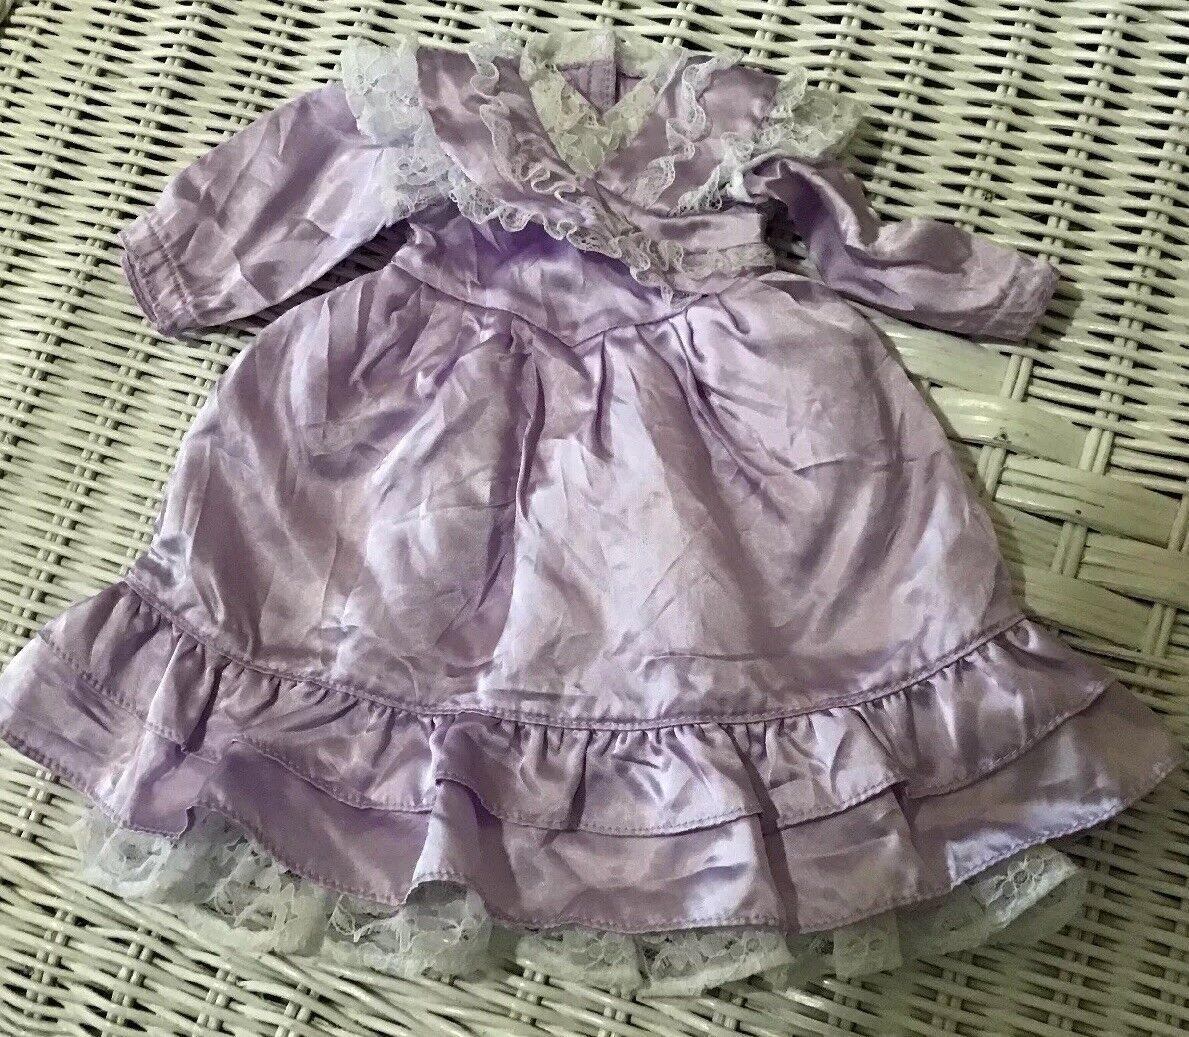 American Girl Doll Samantha Purple Satin With Lace Bridesmaid Dress